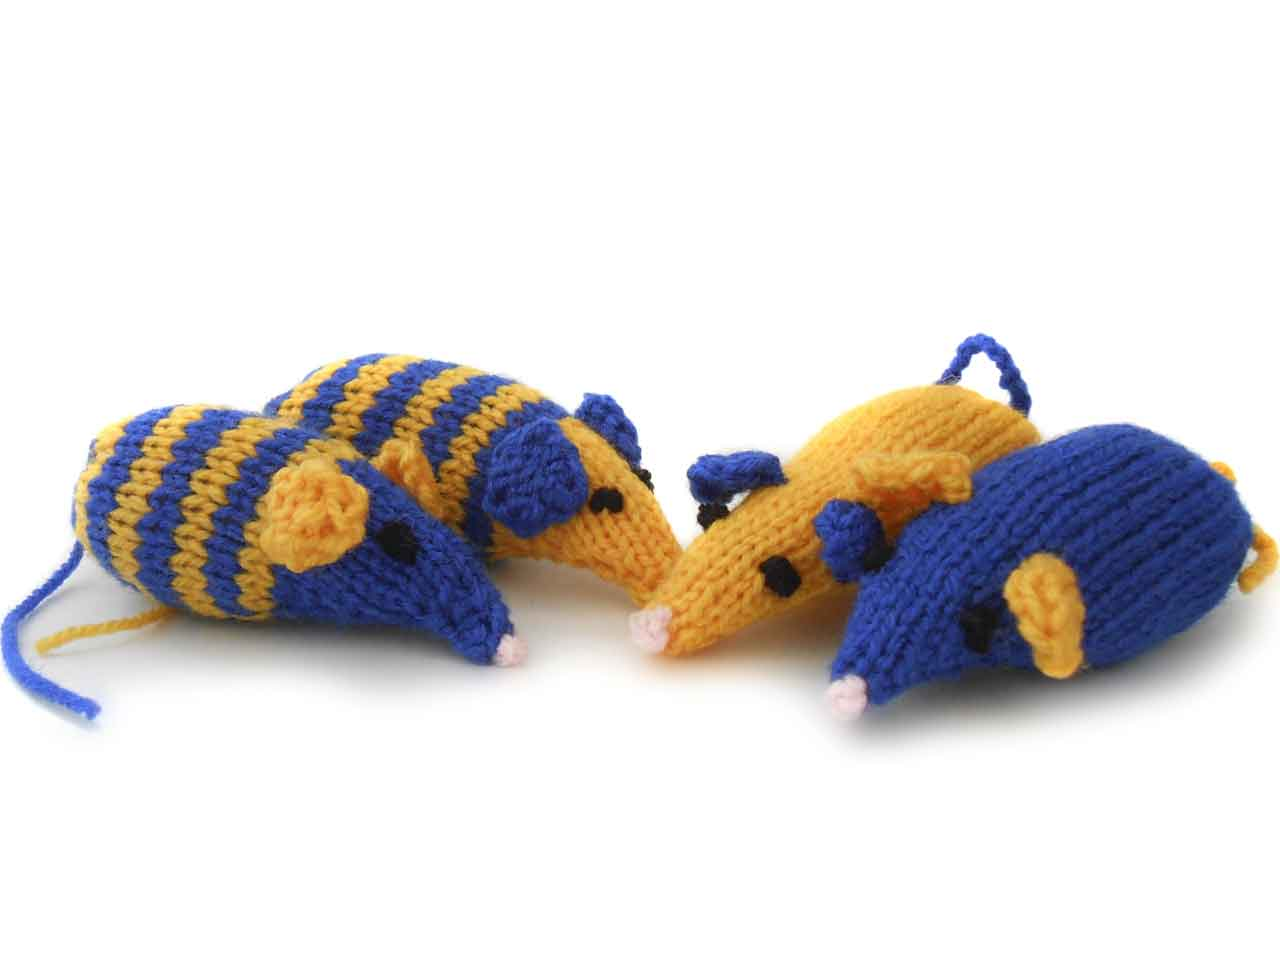 Knitting Pattern Toy Mice : Knitted catnip mice - Saga